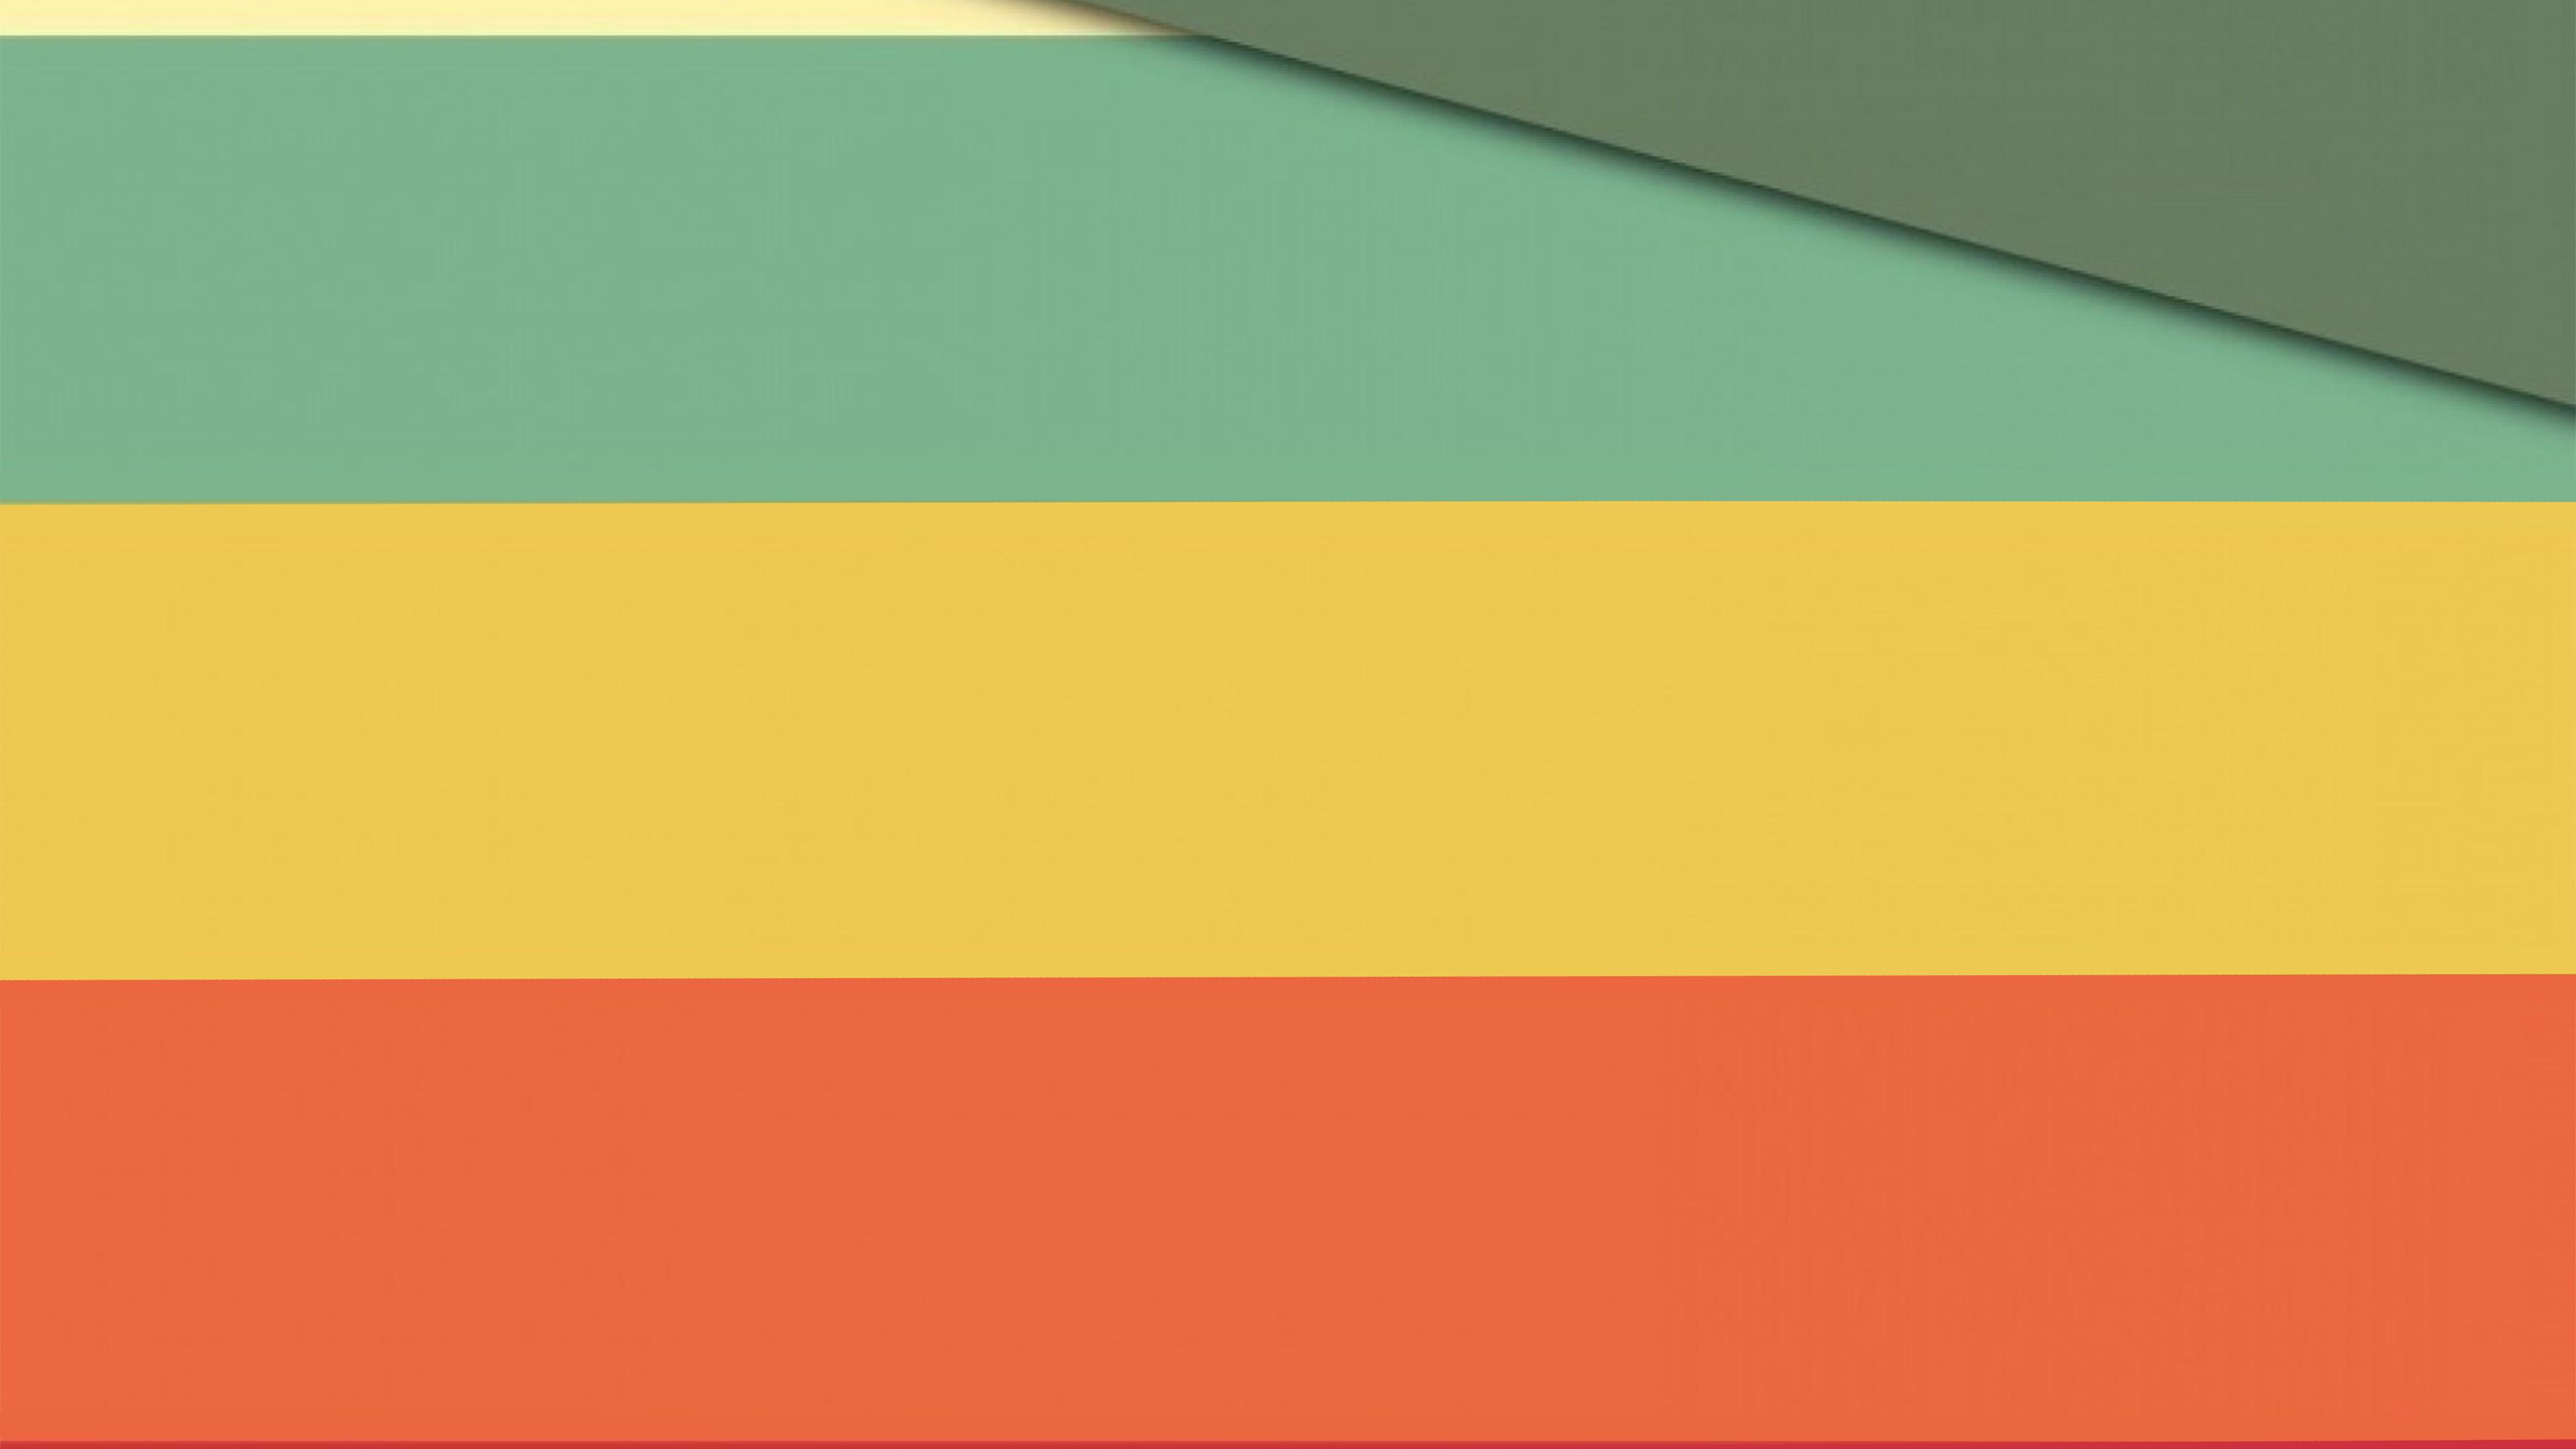 vn59-lines-rainbow-color-horizontal-pattern-wallpaper